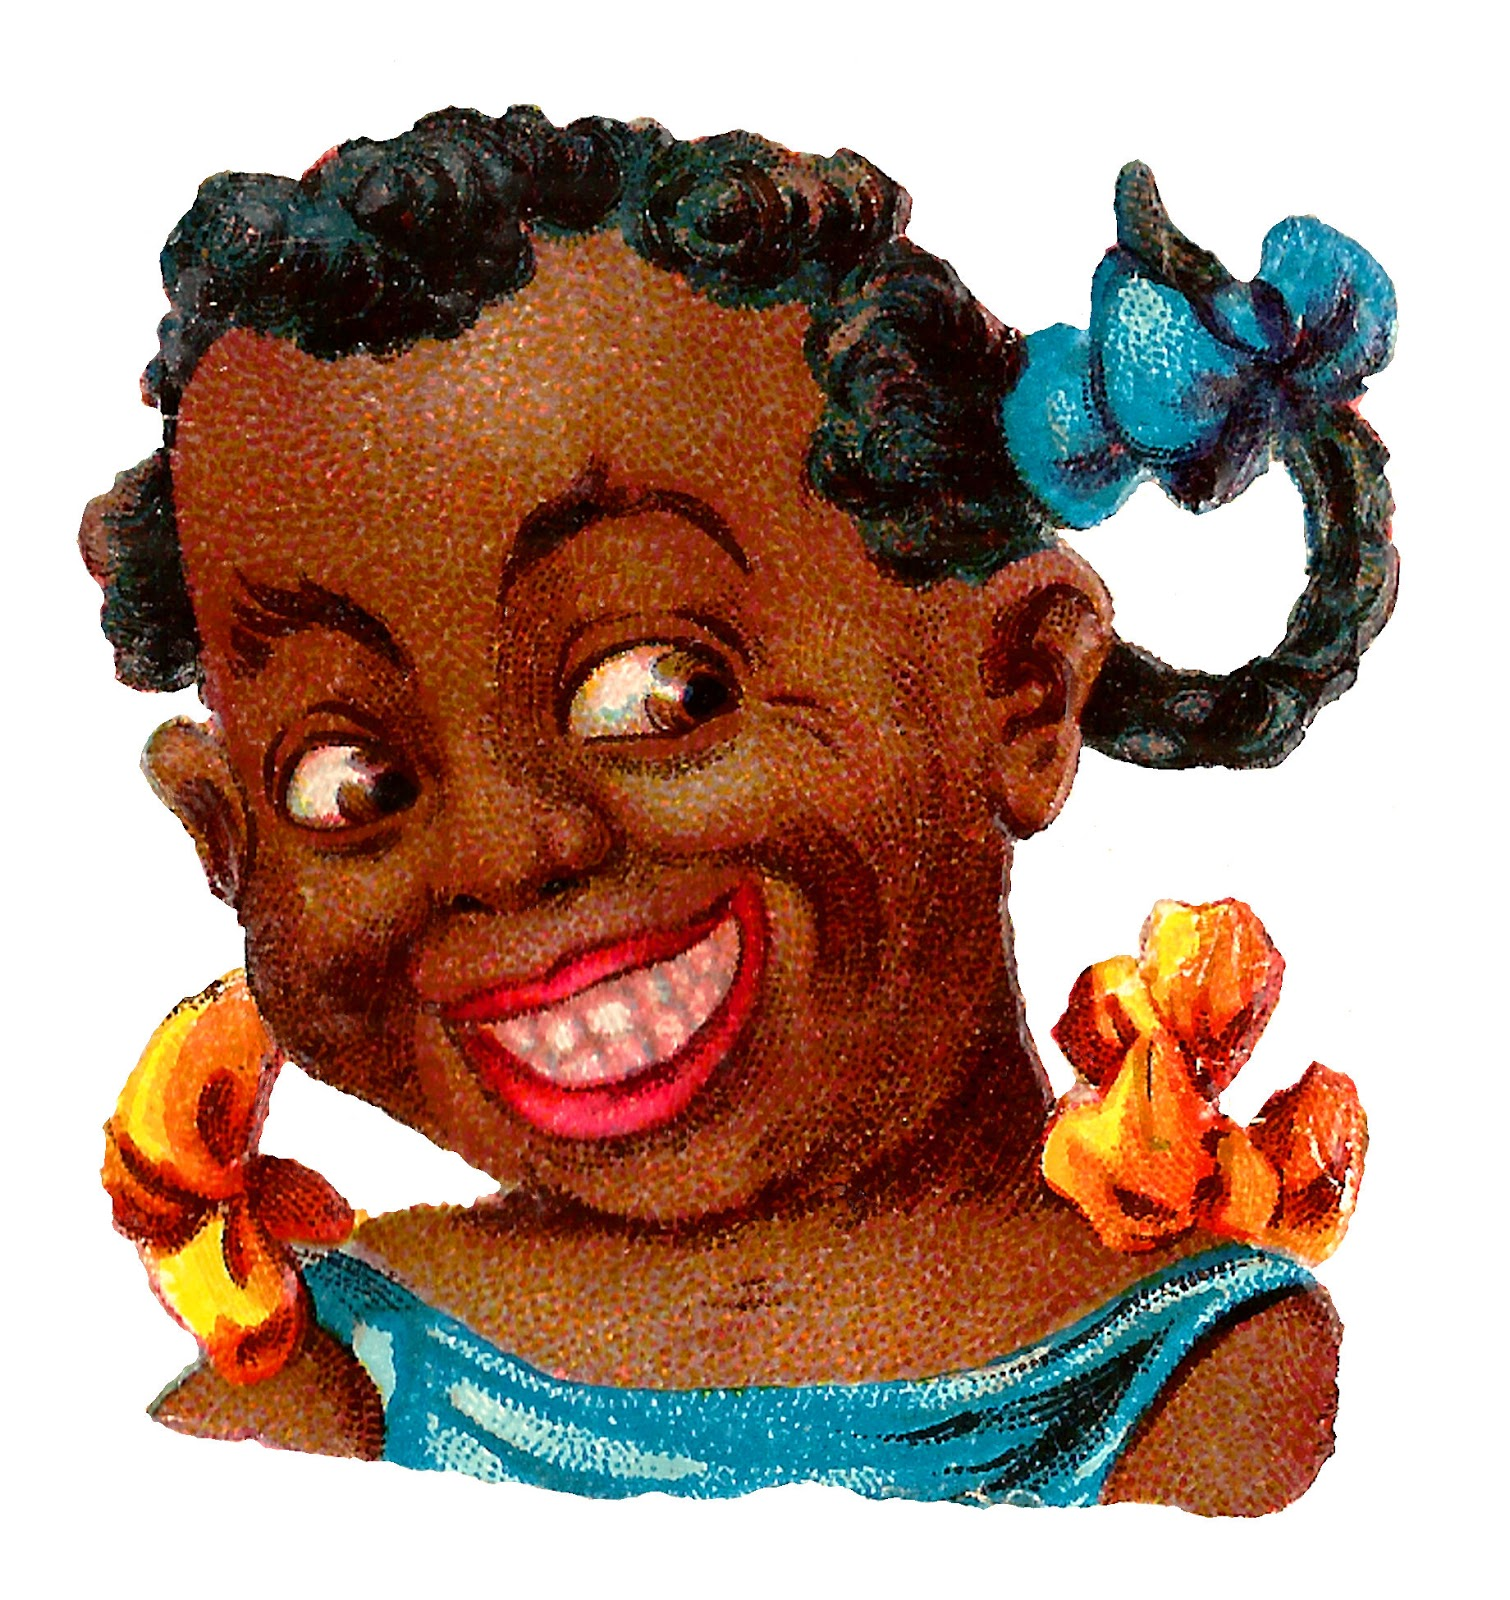 black americana girl portrait victorian clipart digital download [ 1510 x 1600 Pixel ]